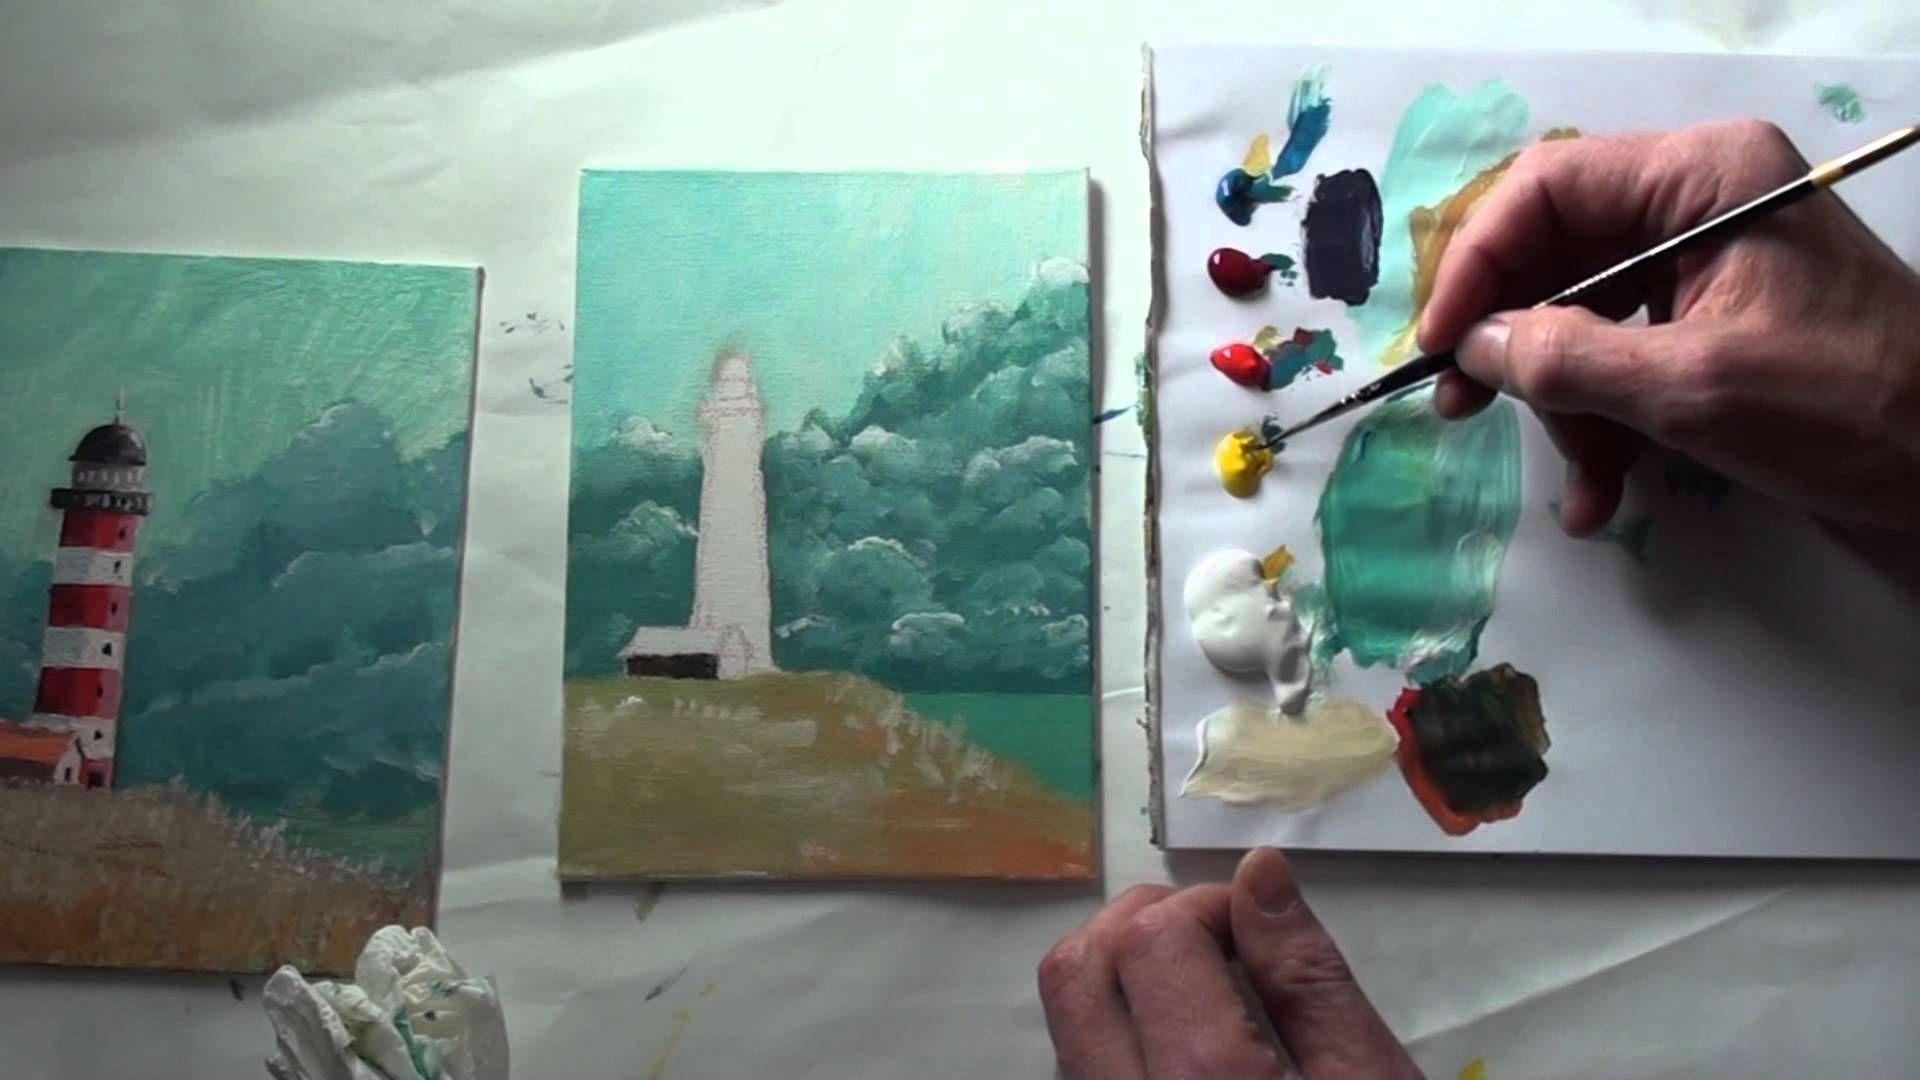 10 Minuten Malerei Leuchtturm Vor Sturmhimmel Malerei Strand Aquarell Leuchtturm